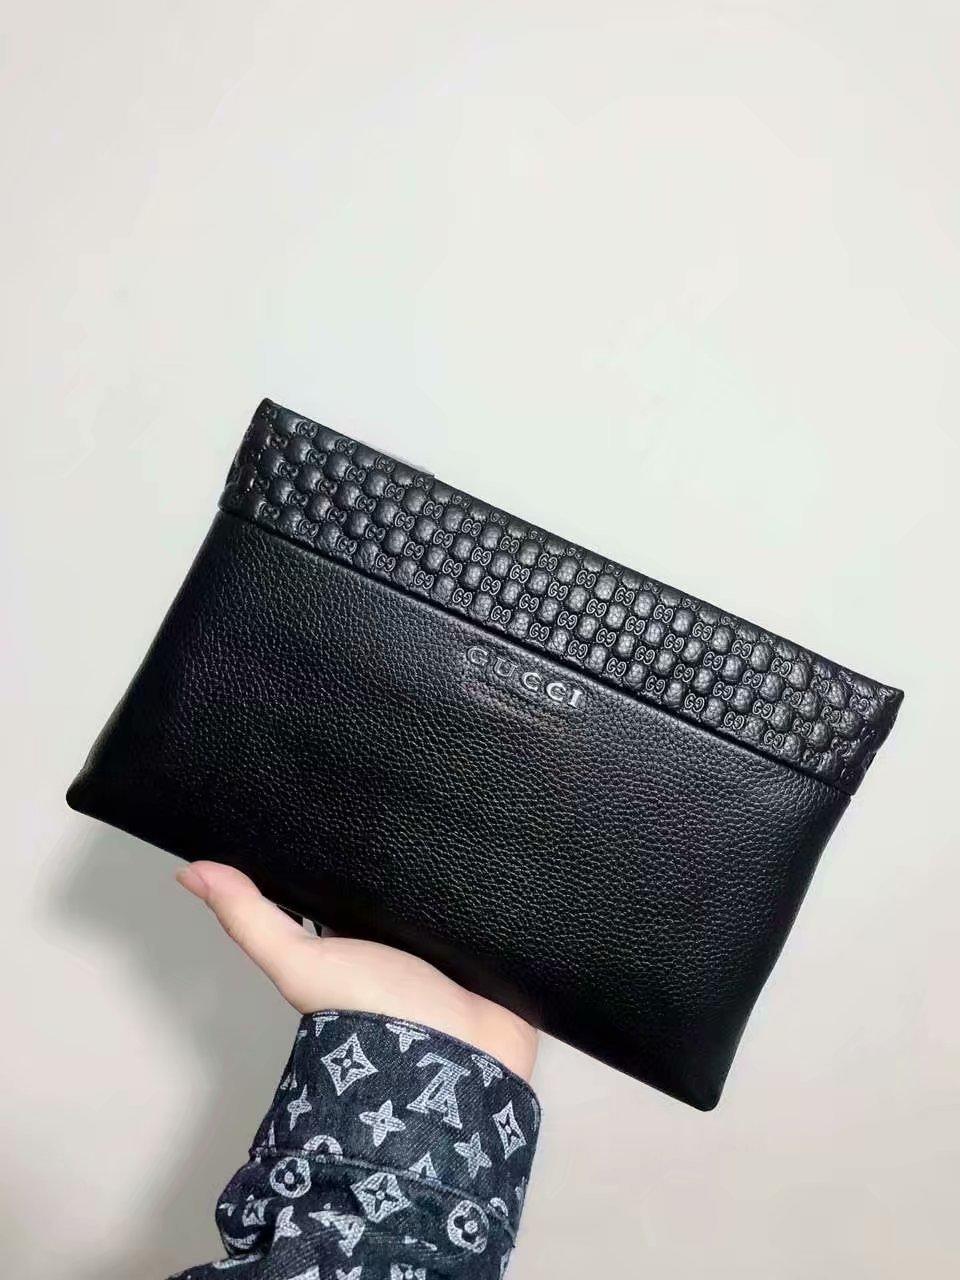 Gucci グッチ メンズ クラッチバッグ 専門店信頼 代引き届く 日本国内発送 23401